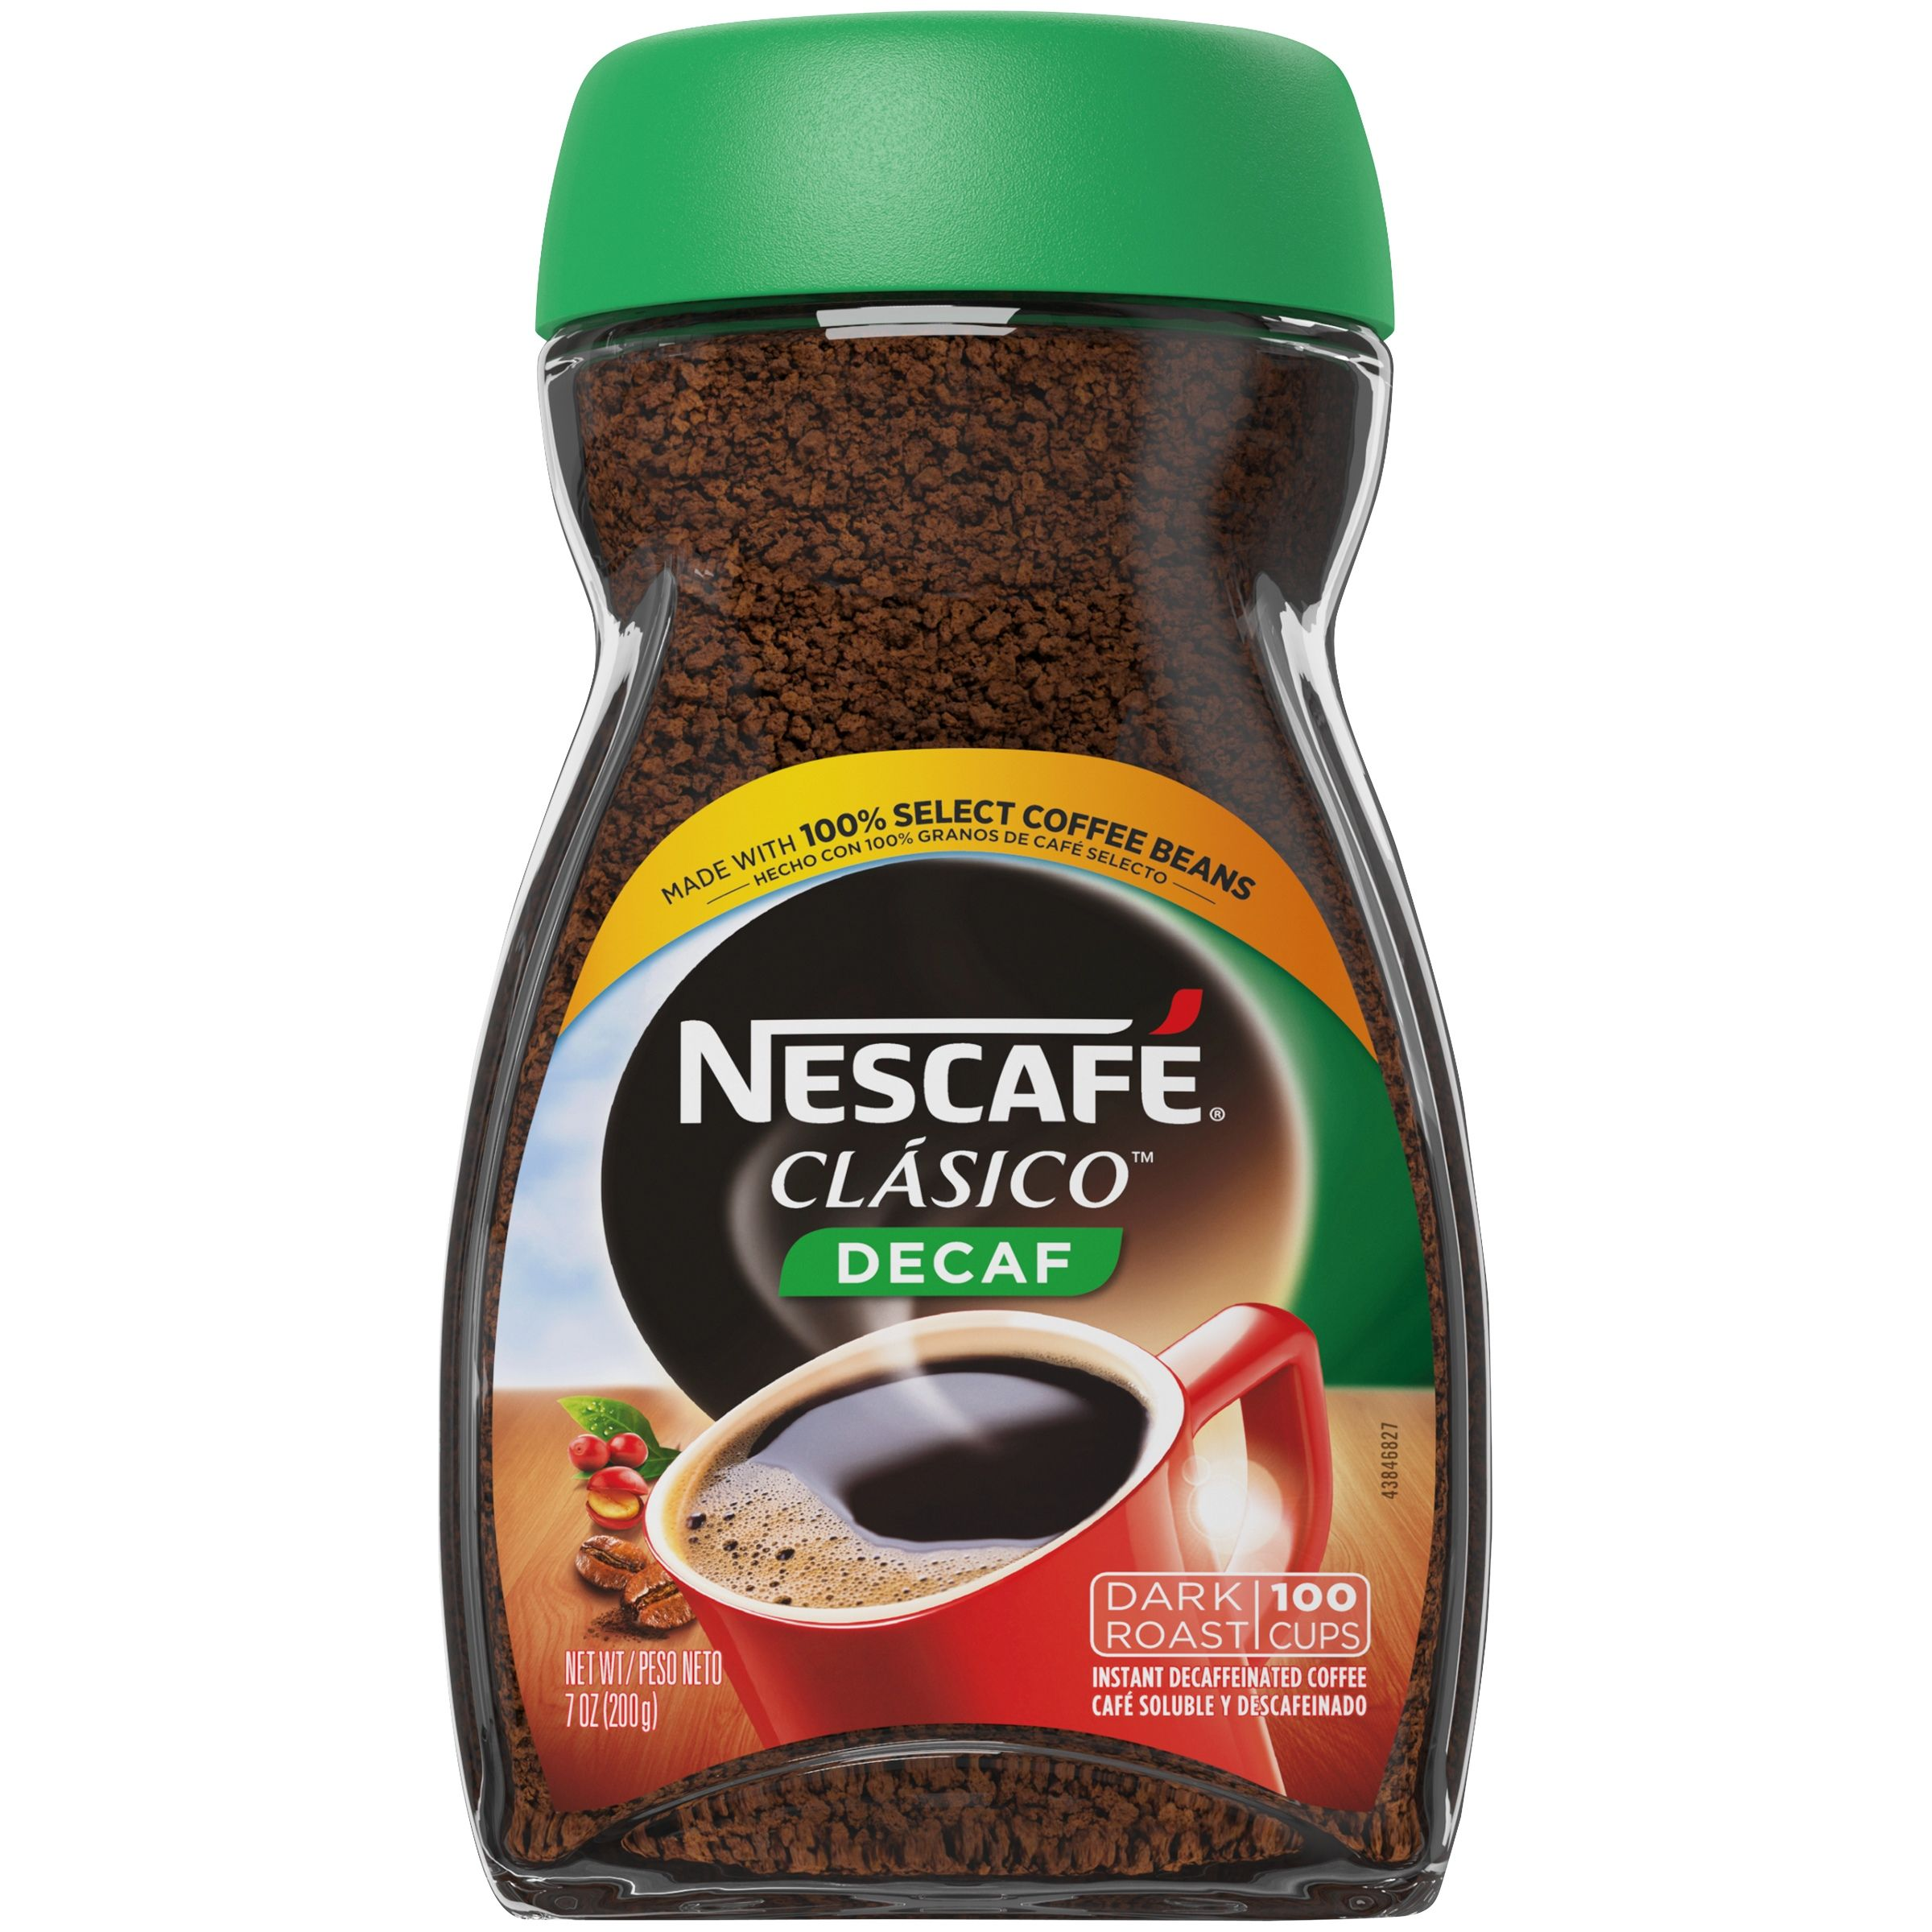 NESCAFE CLASICO Decaf Dark Roast Instant Coffee 7 oz. Jar